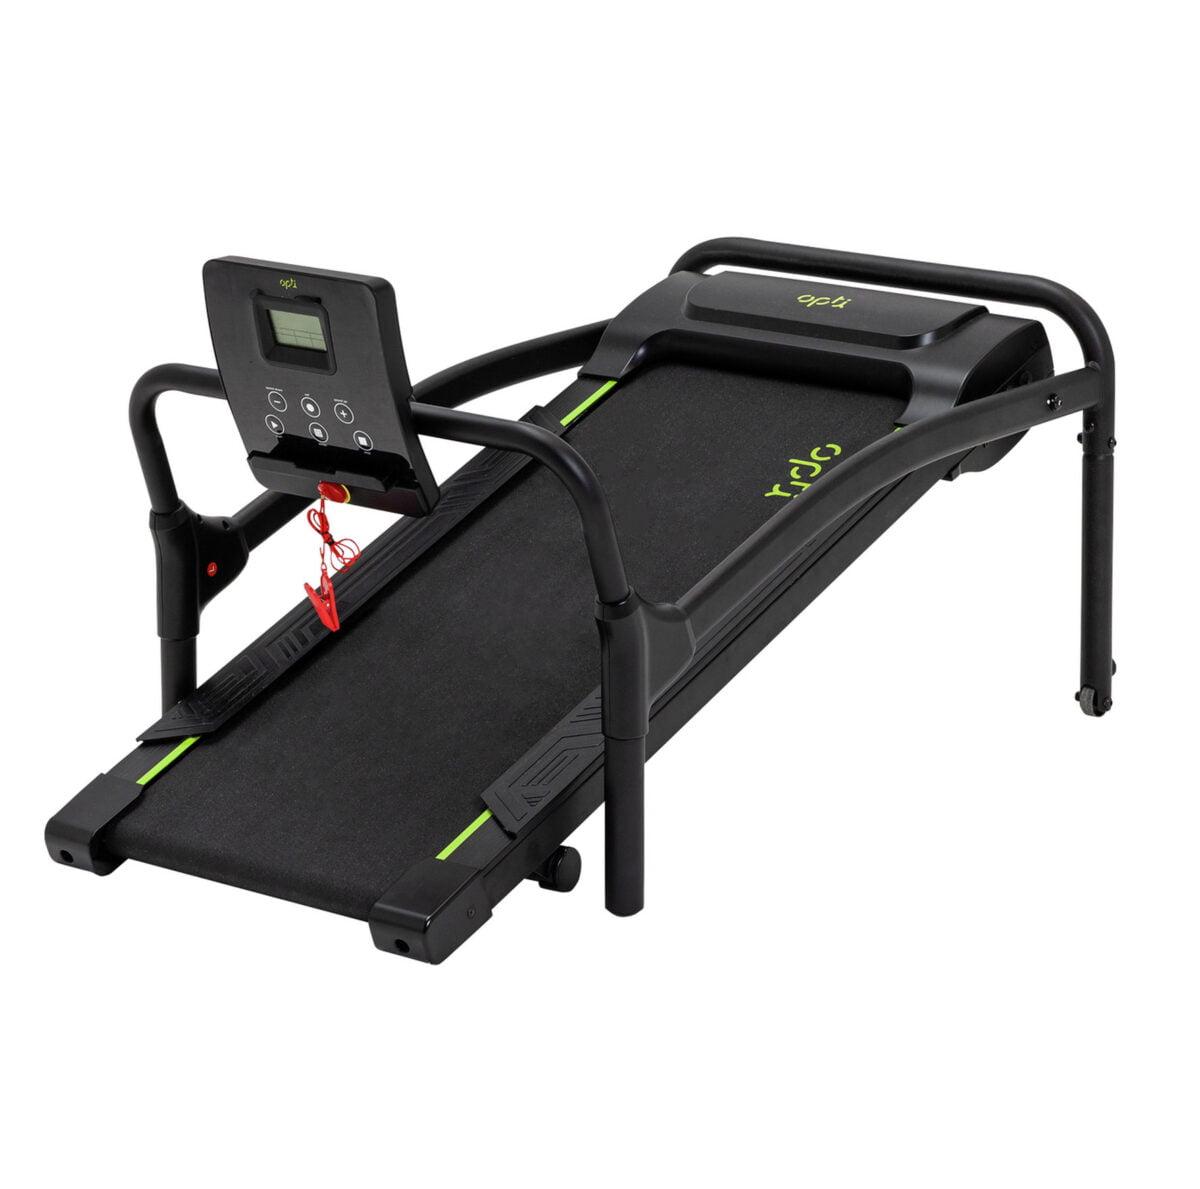 Opti Motorised Walking Treadmill folded away